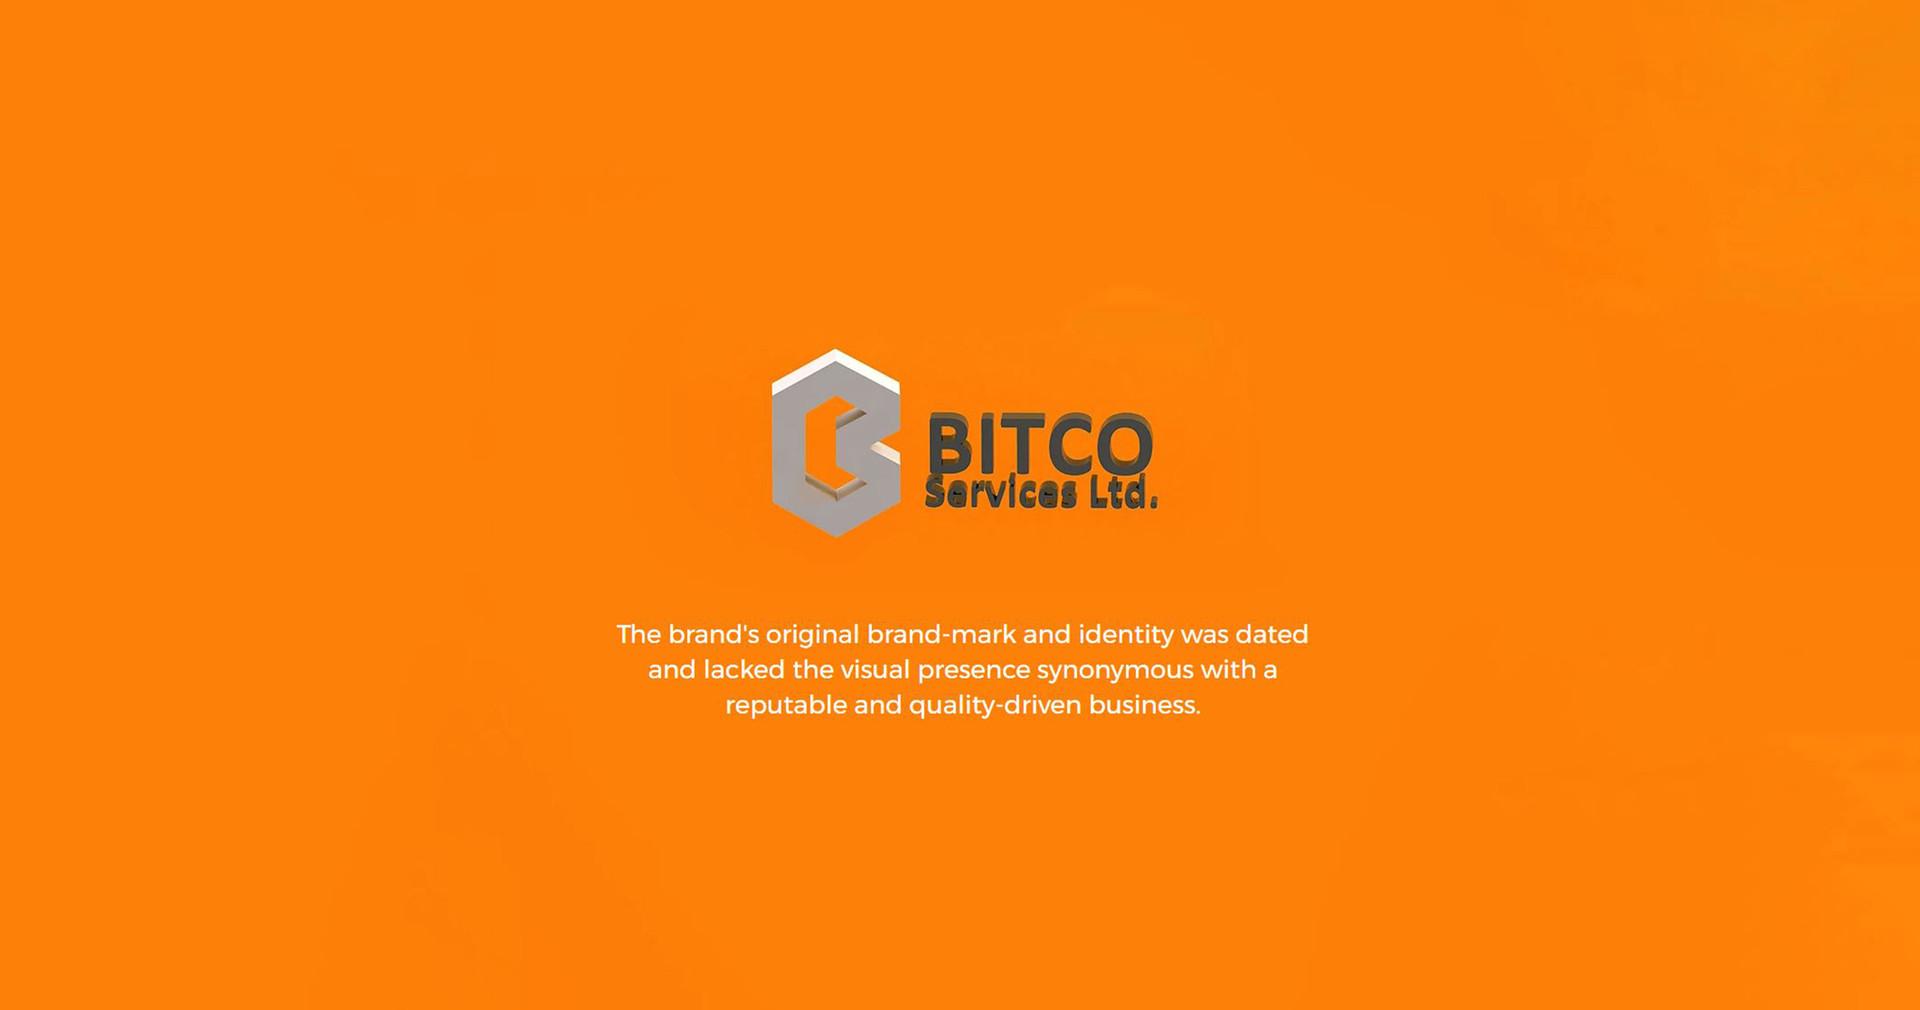 bitco services old.jpg